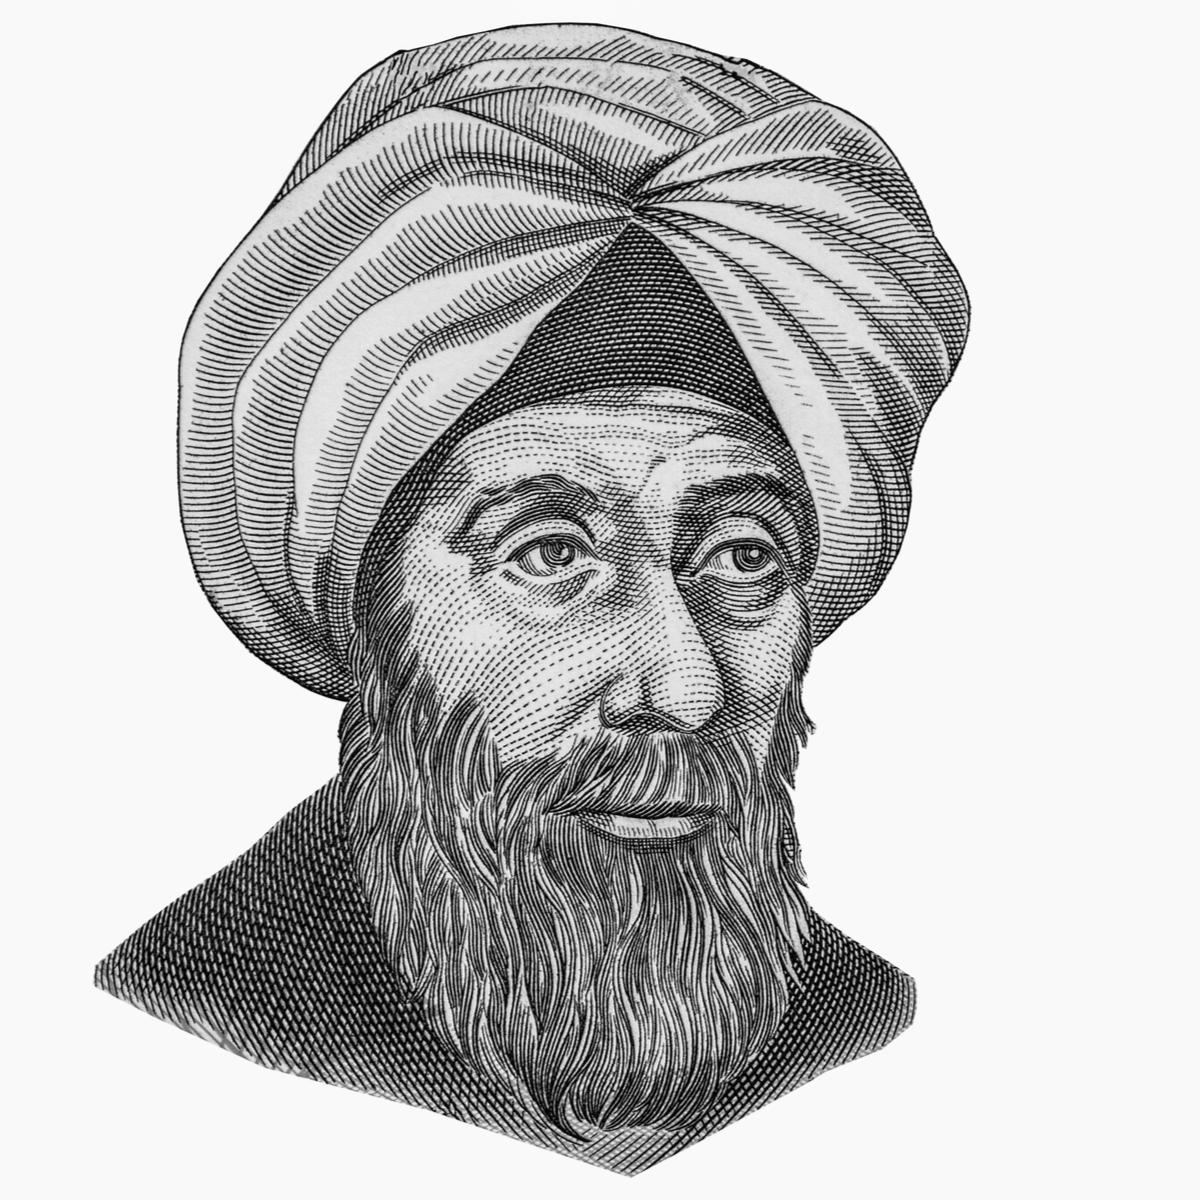 ibn al-haytham inventions